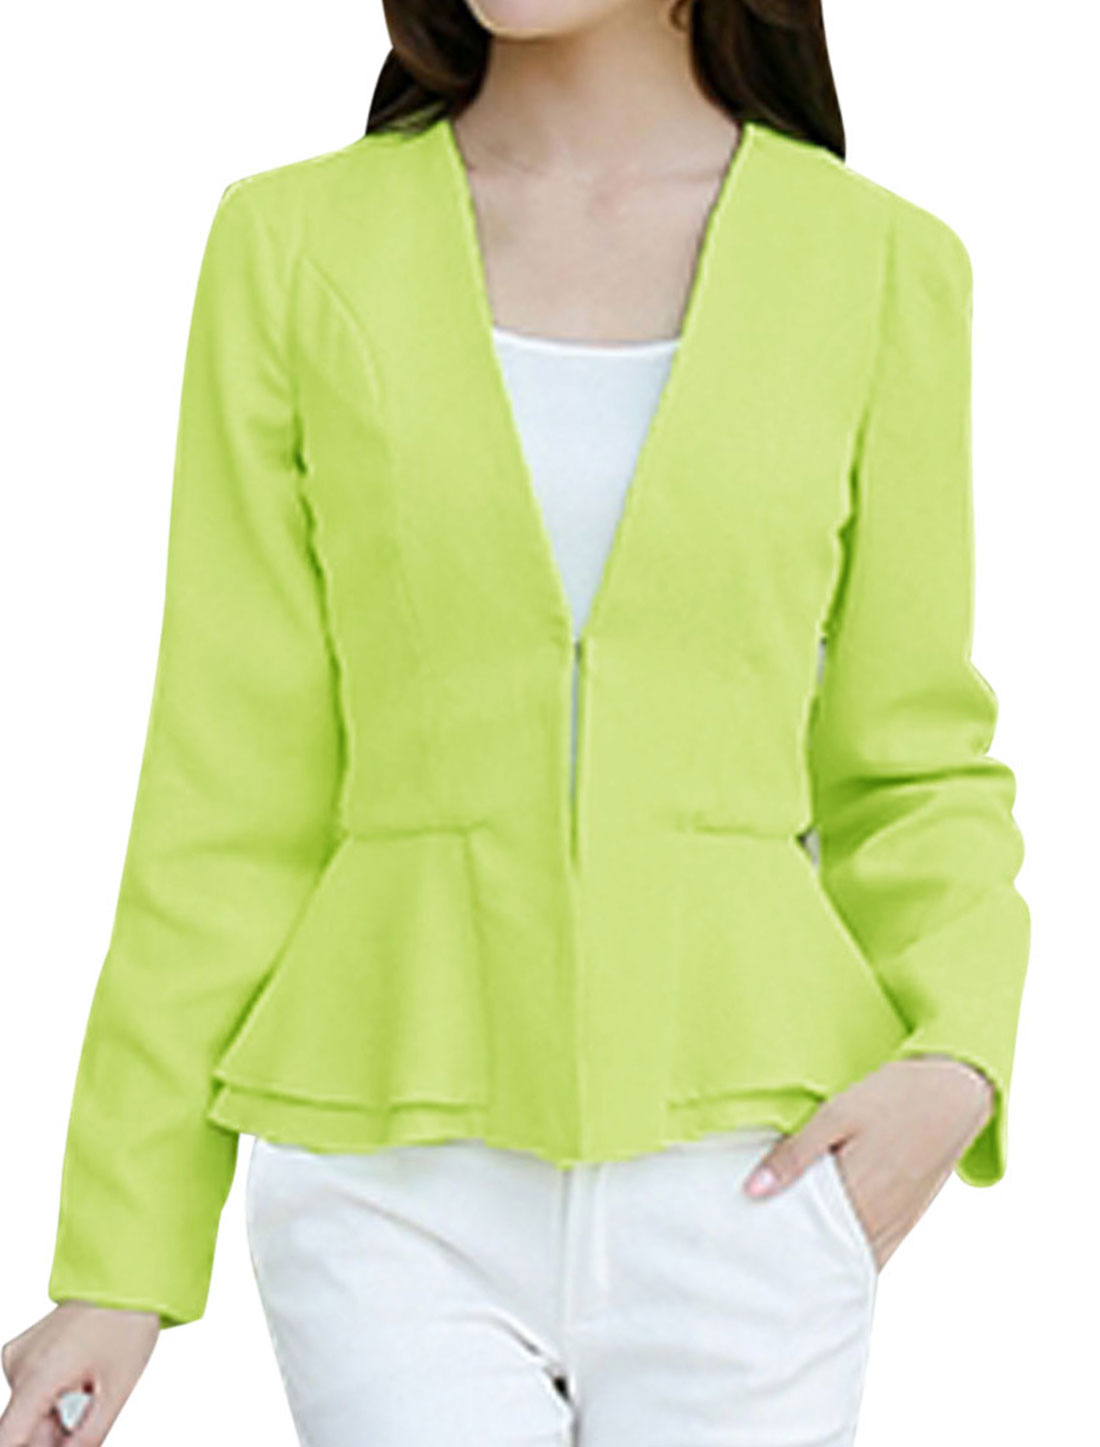 Lady Korean Style Slim Hook Eye Closure Peplum Blazer Jacket Lime M